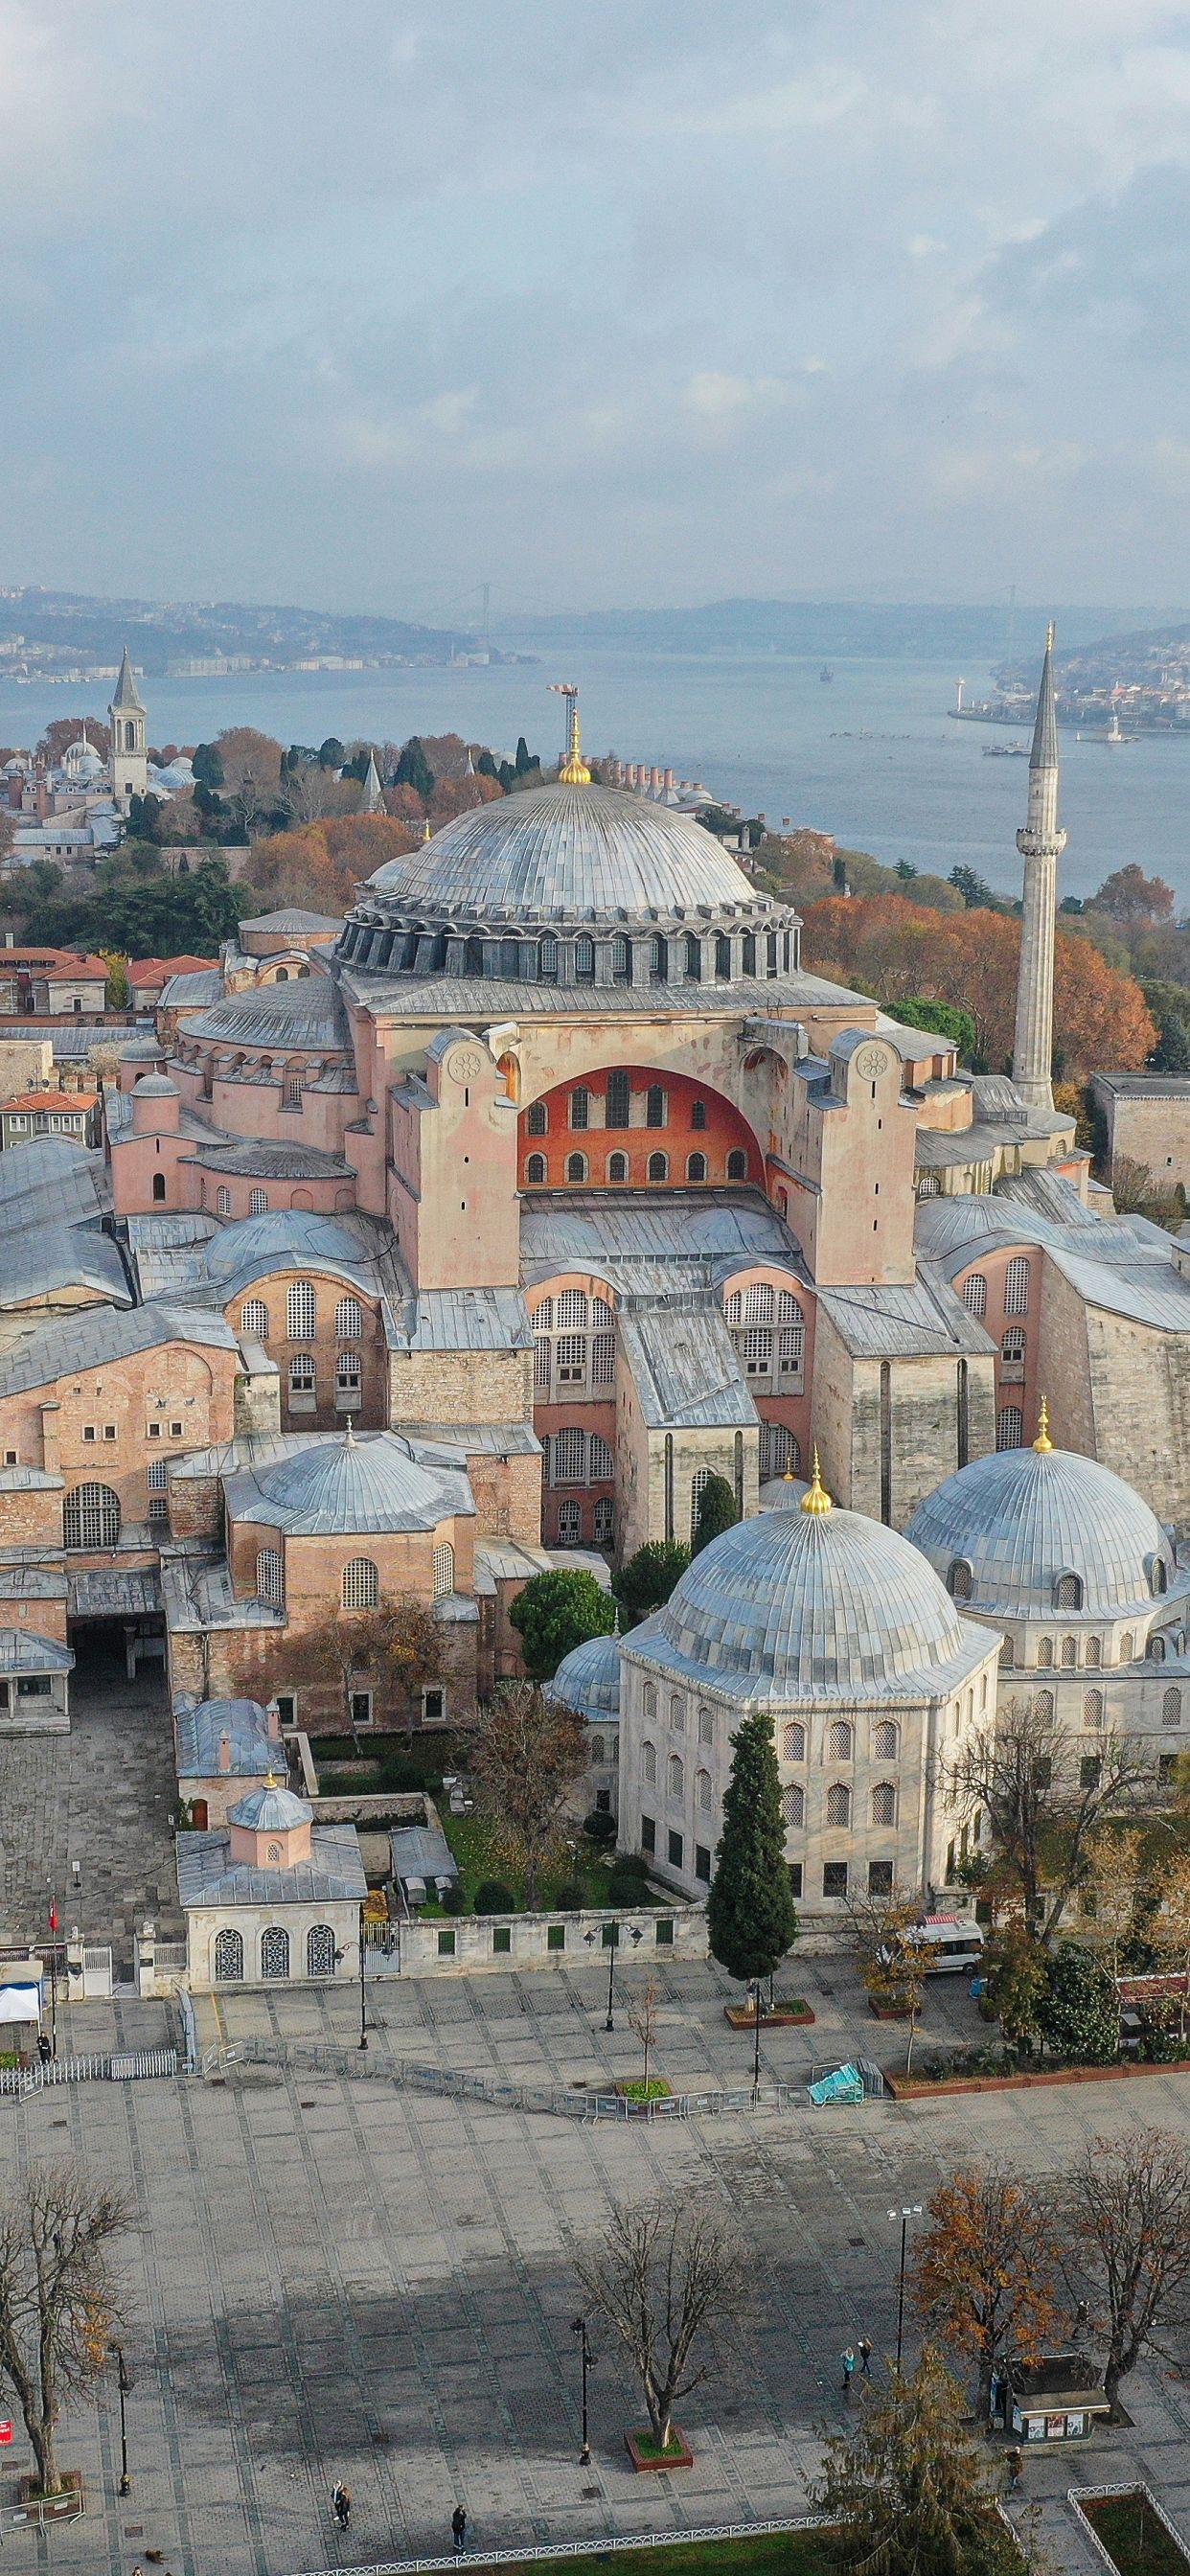 December 7, 2020 - 土耳其购买中国疫苗 土耳其实行全国禁足令,圣索菲亚清真寺周围空荡无人,伊斯坦布尔